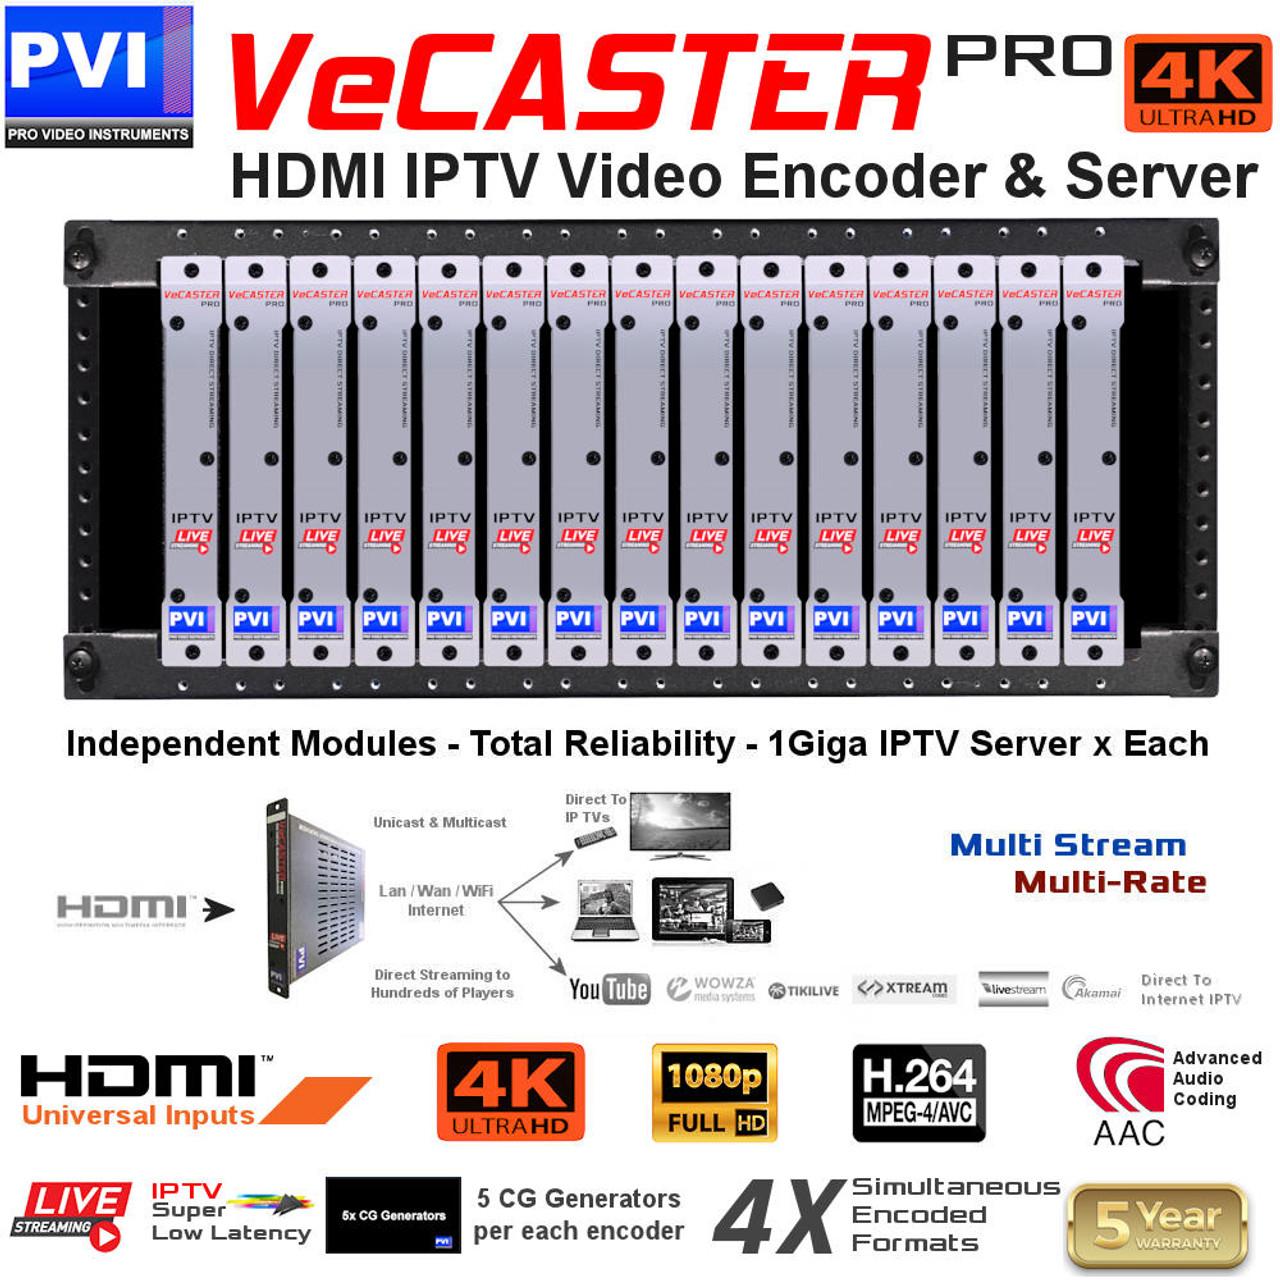 Provideoinstruments Vecaster 4k H264 Professional Single Channel Iptv Wiring Diagram Uhd Encoder